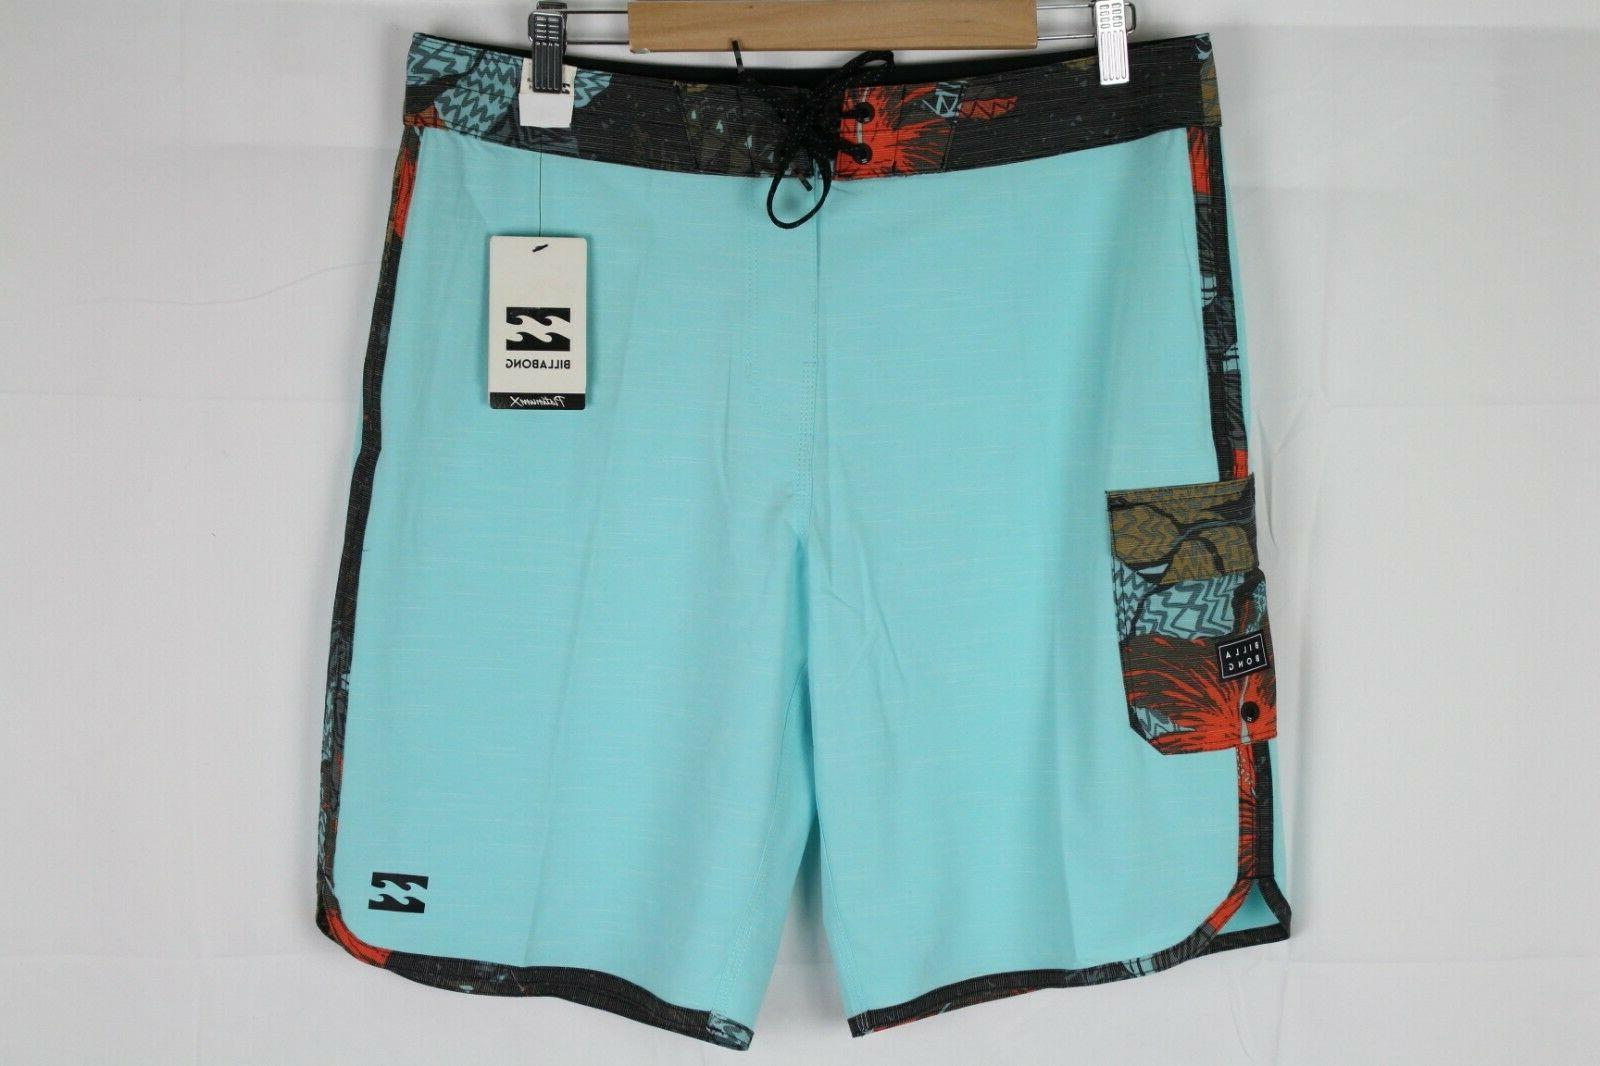 new men s 73 x board shorts